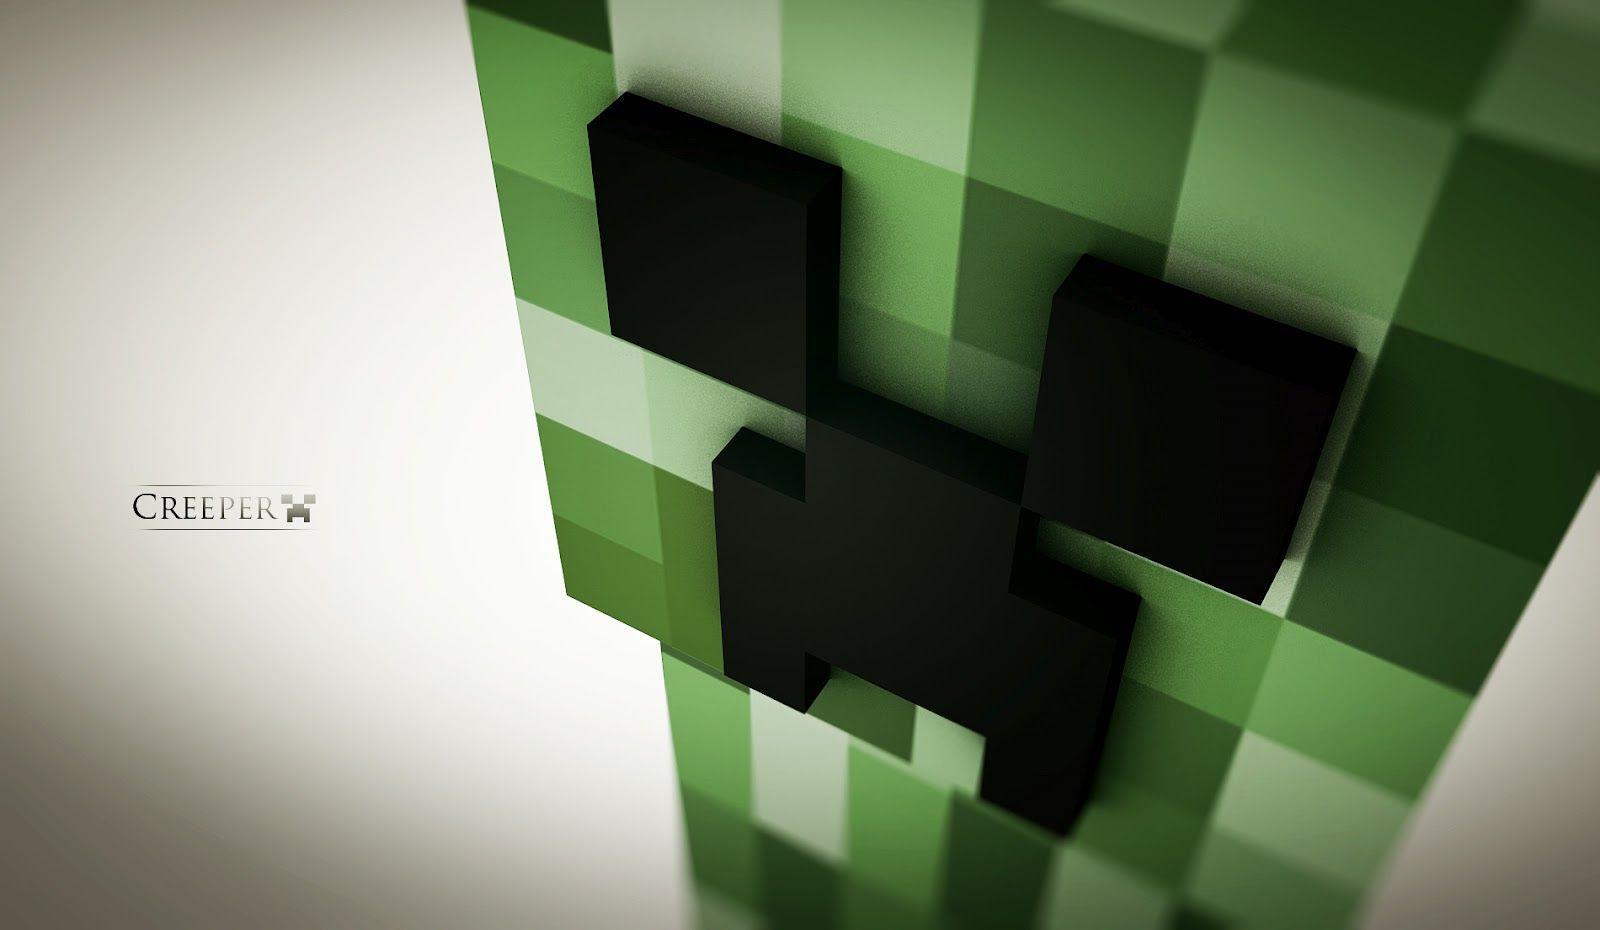 Minecraft Creeper Wallpaper Desktop Gamers Wallpaper 1080p